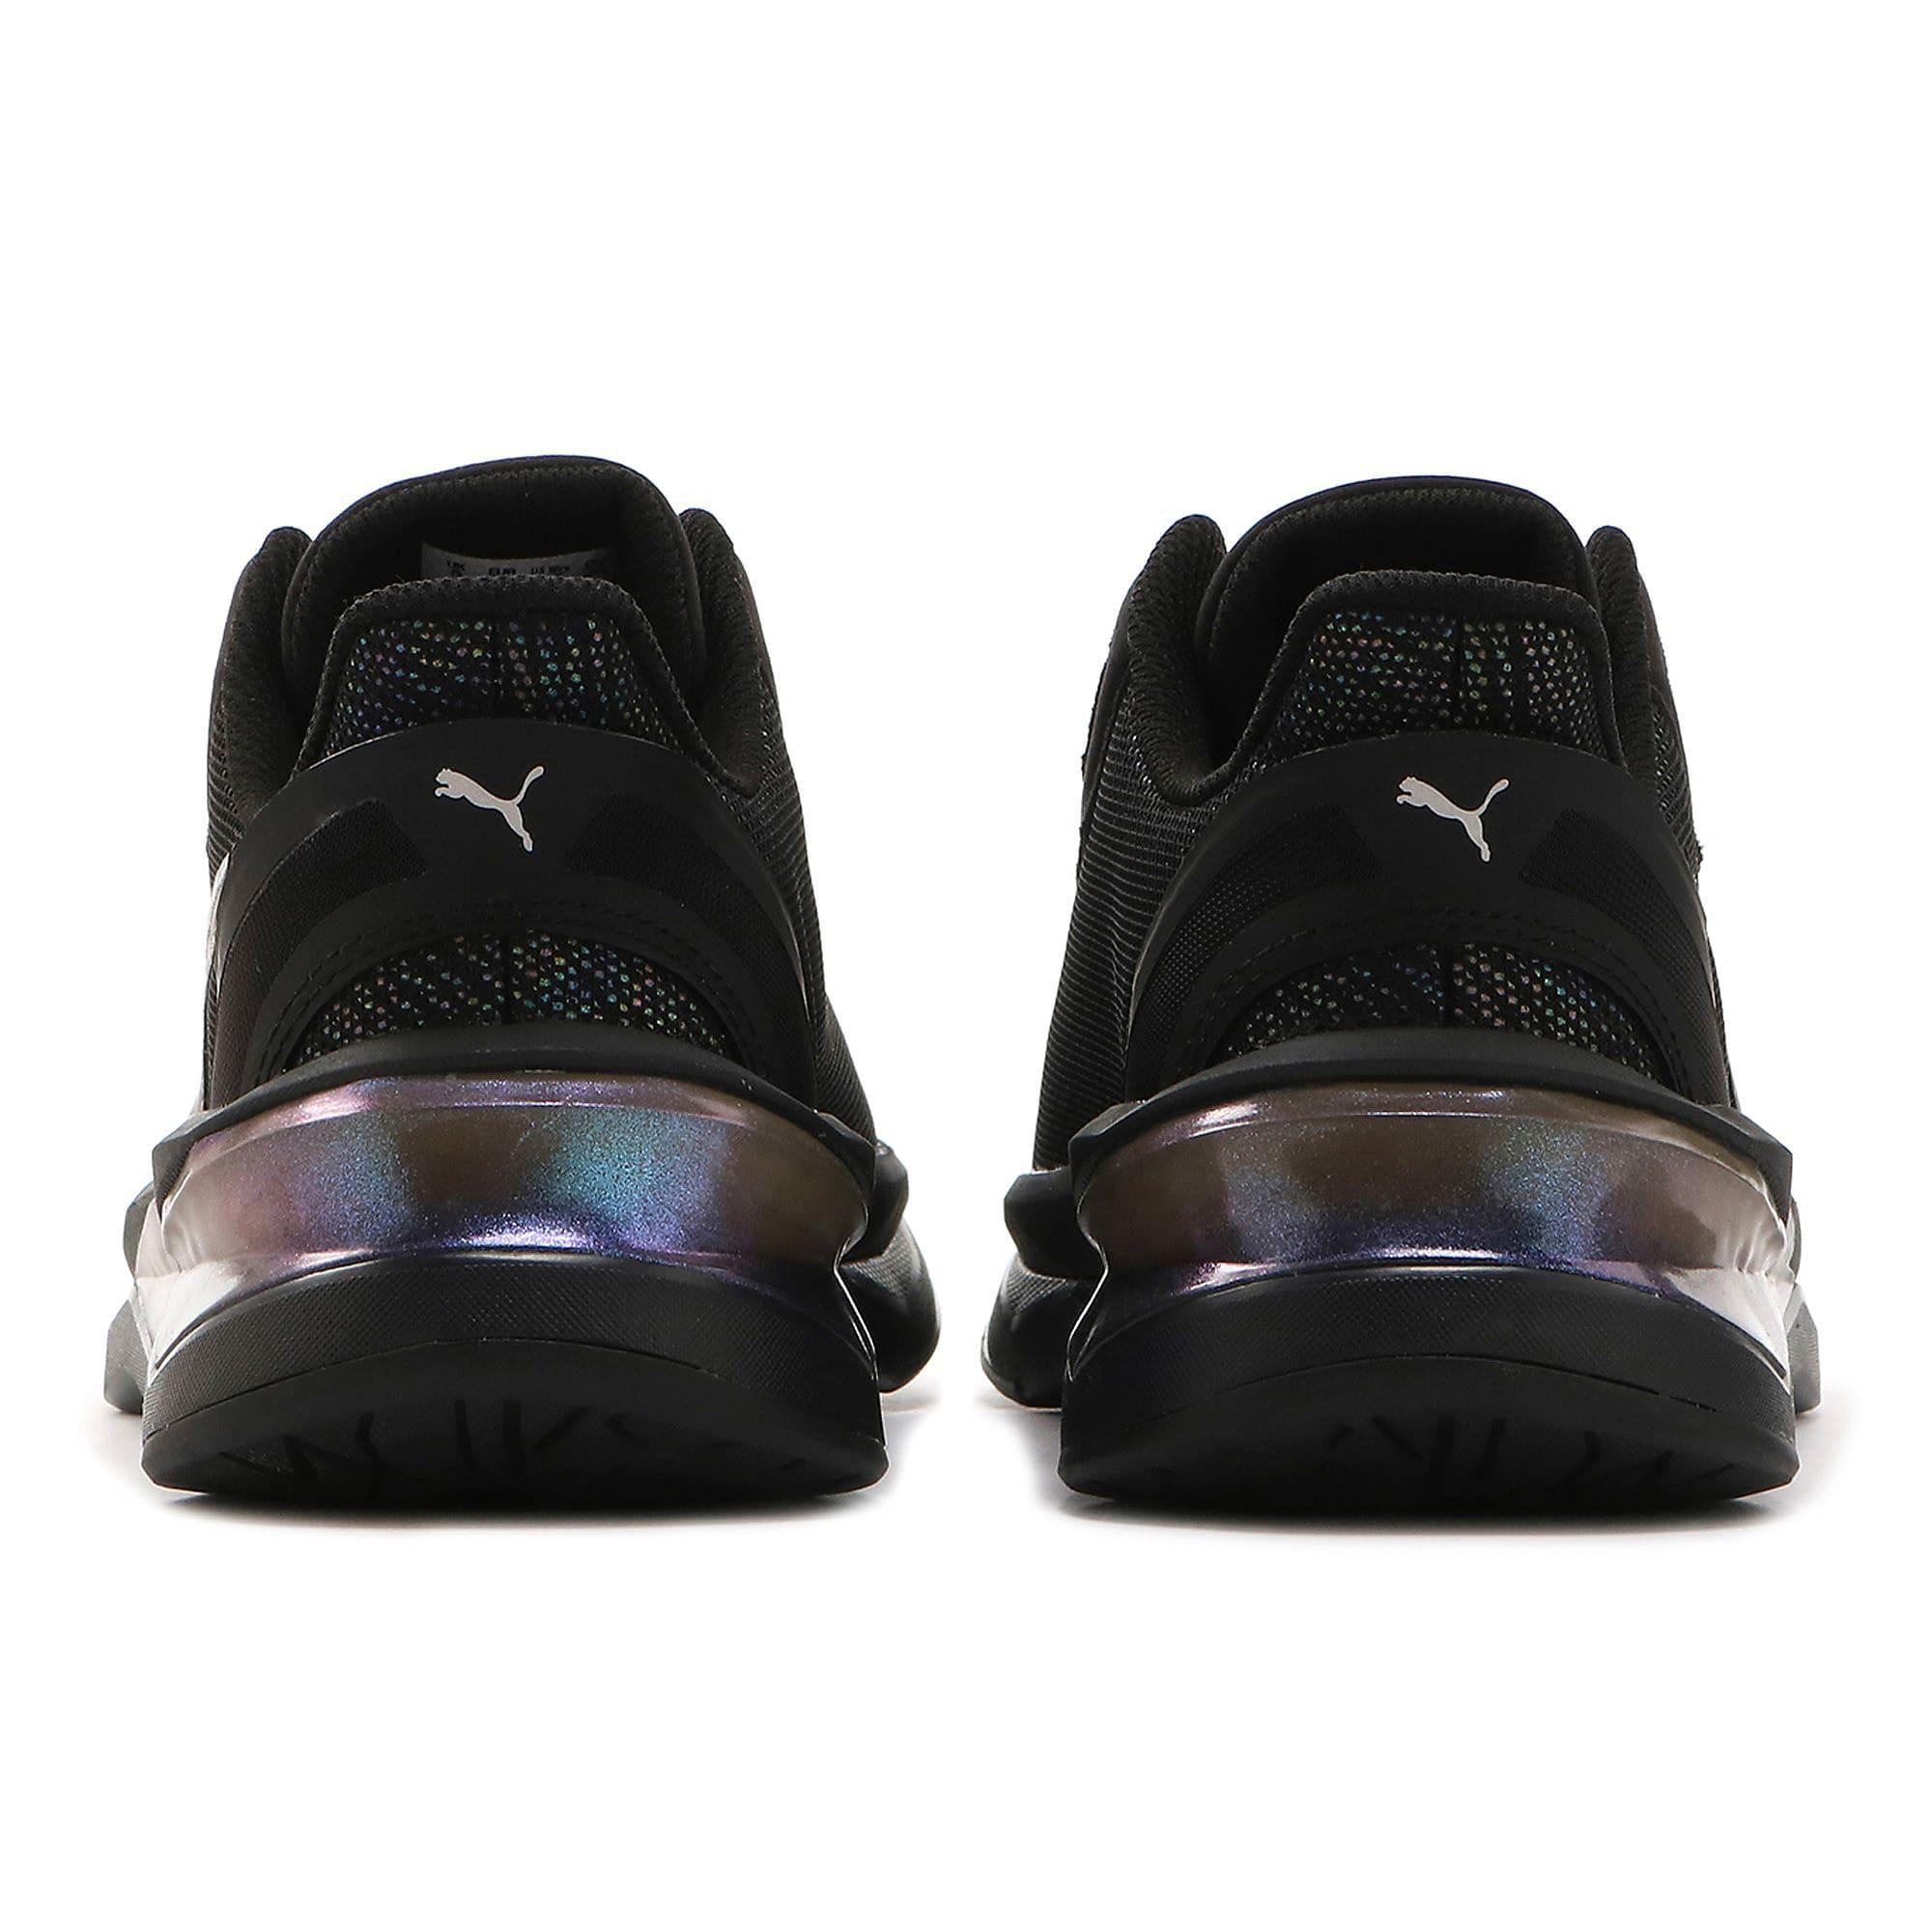 Thumbnail 3 of LQDCELL Shatter XT Luster Women's Training Shoes, Puma Black-Puma Black, medium